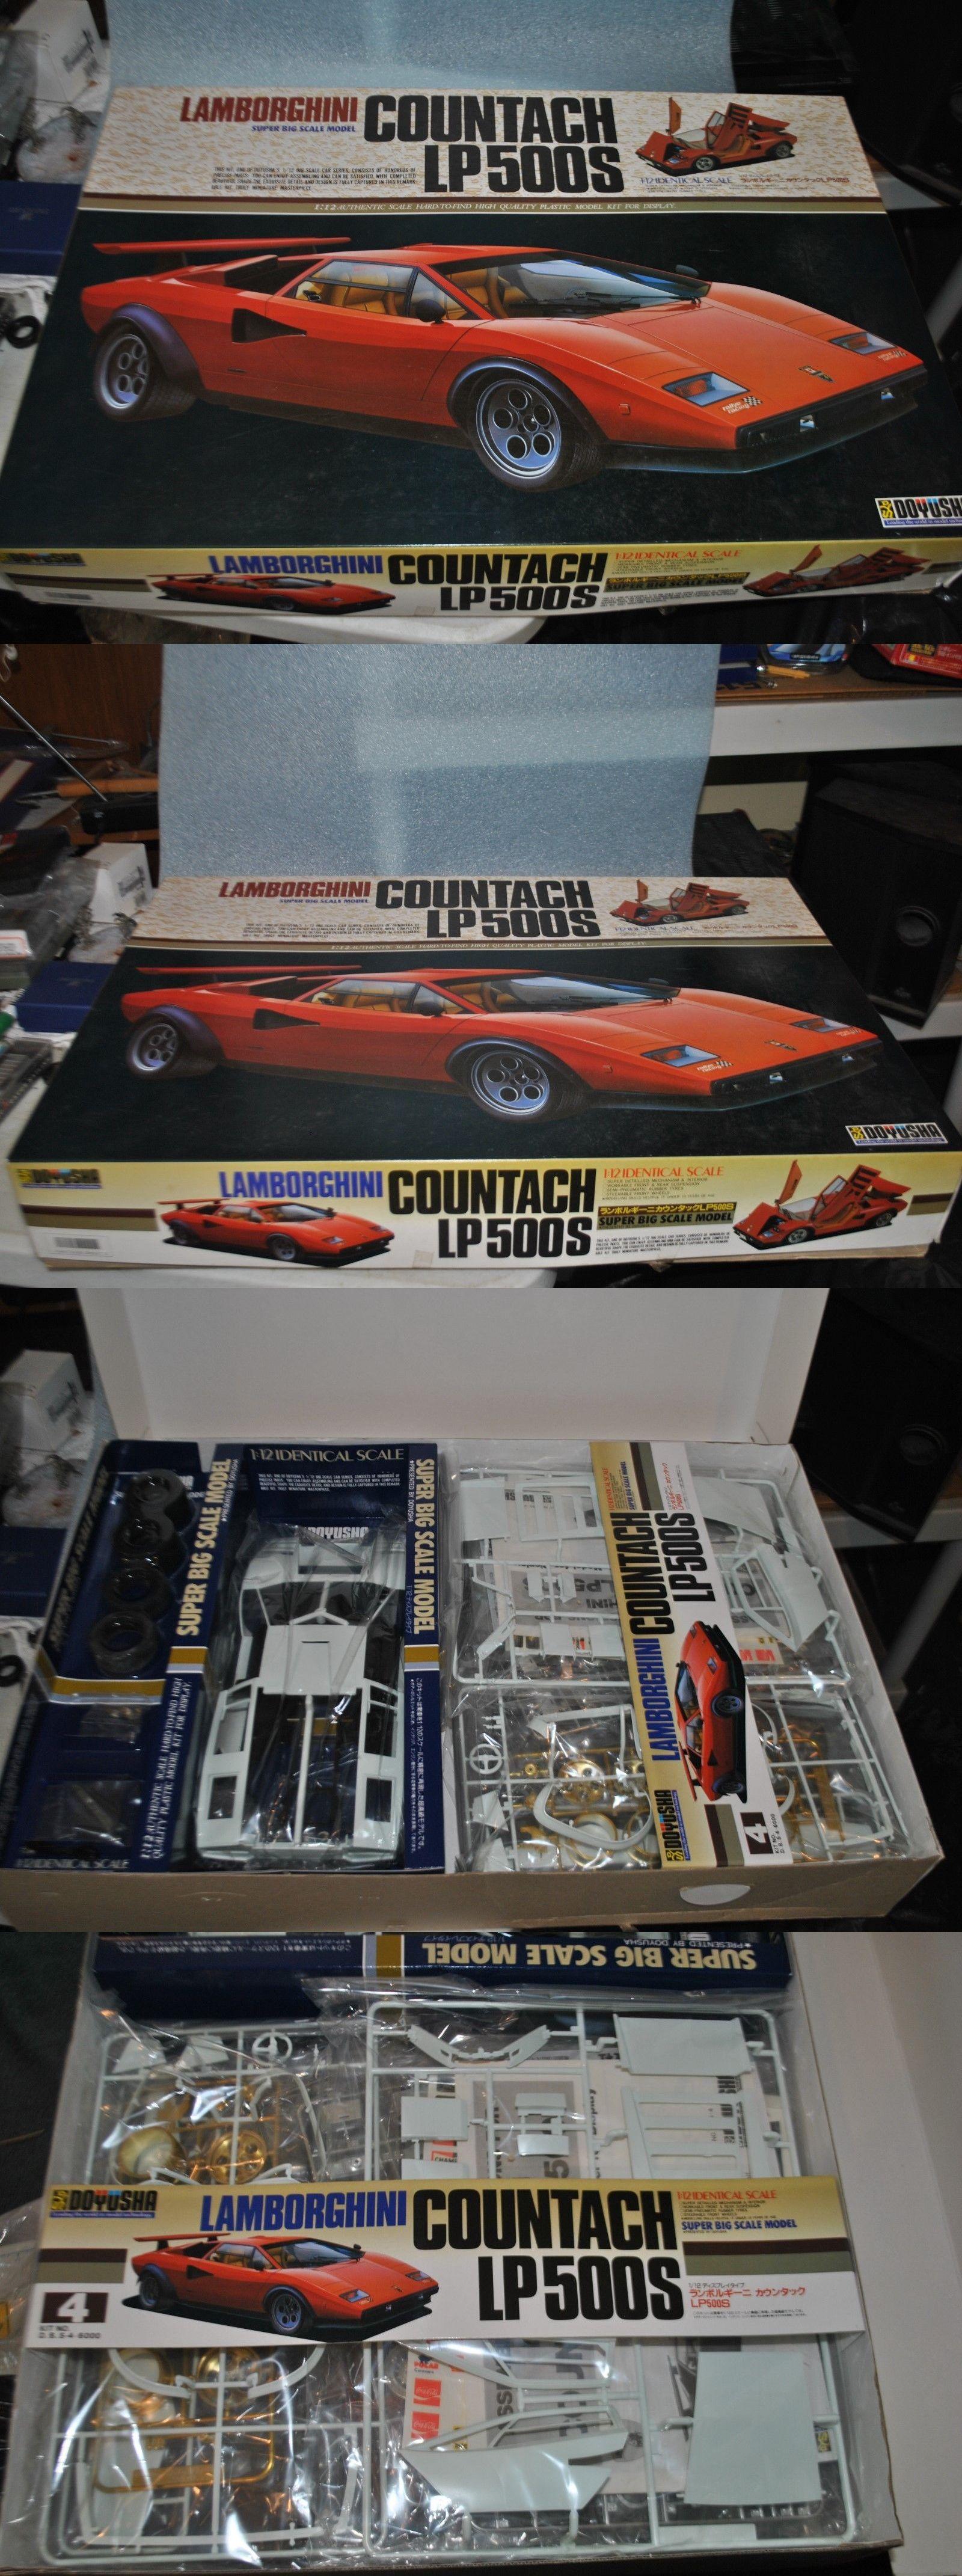 1 12 Scale 145972 Doyusha 1 12 Lamborghini Countach Lp500s Super